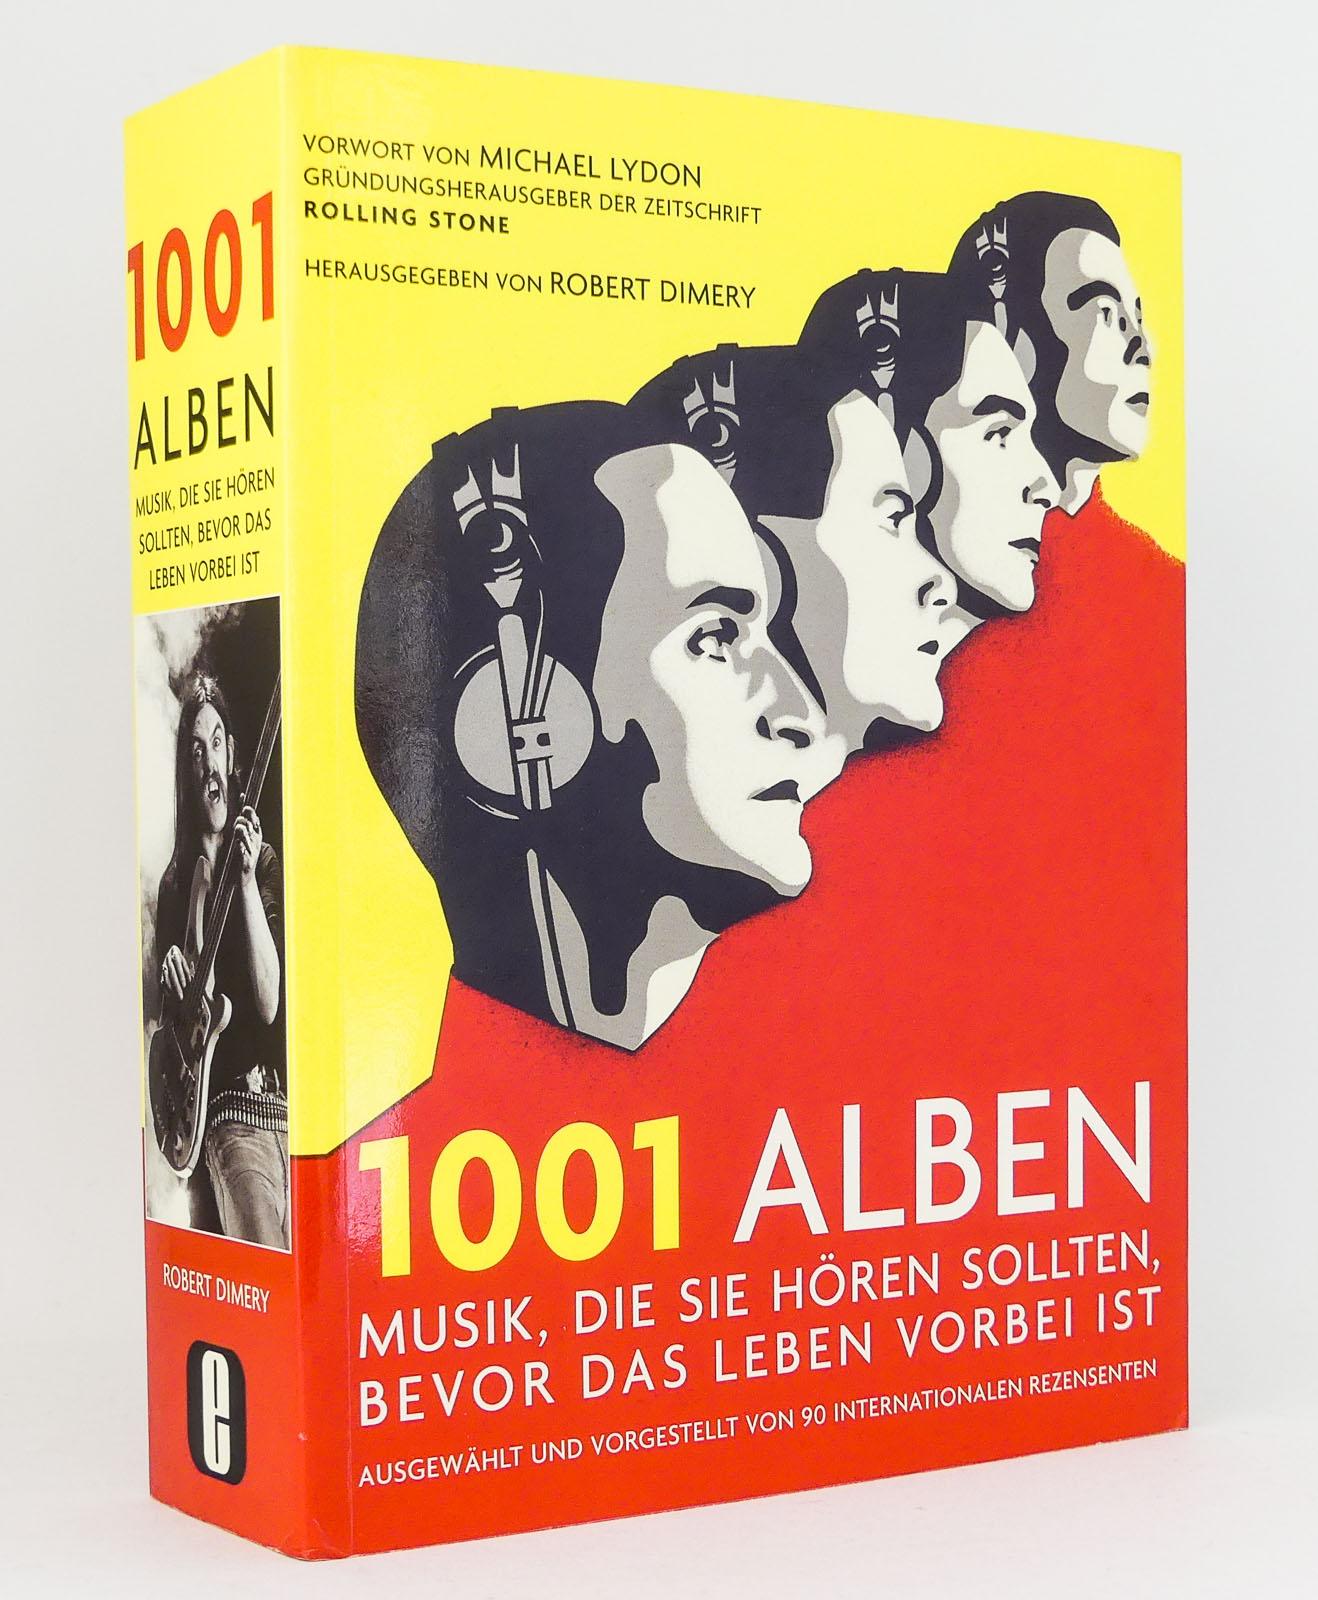 1001 Alben : Musik, die Sie hören: Dimery, Robert [Hg.]